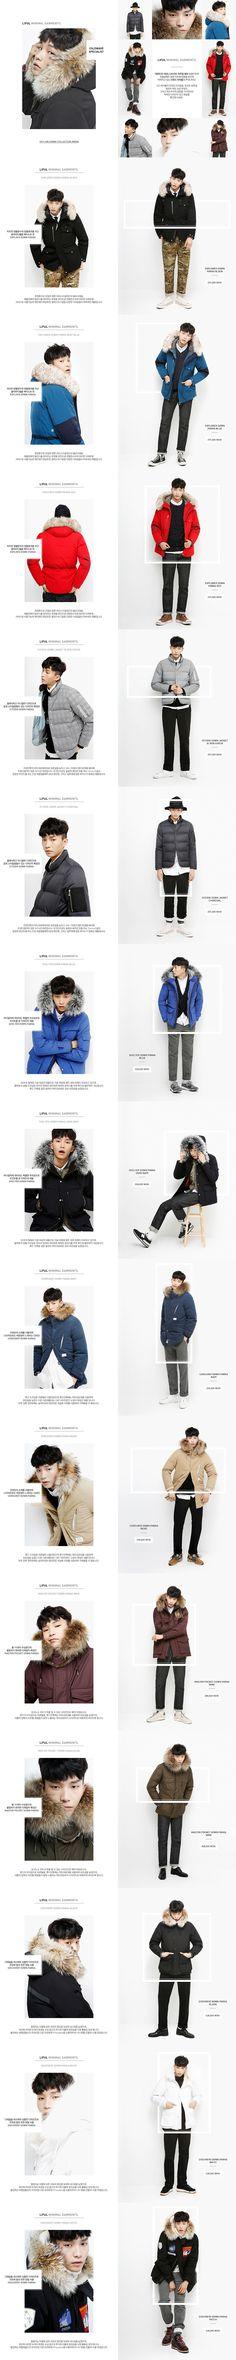 LIFUL MINIMAL GARMENTS  Korean domestic fashion brand. Brand reconstitution artwork